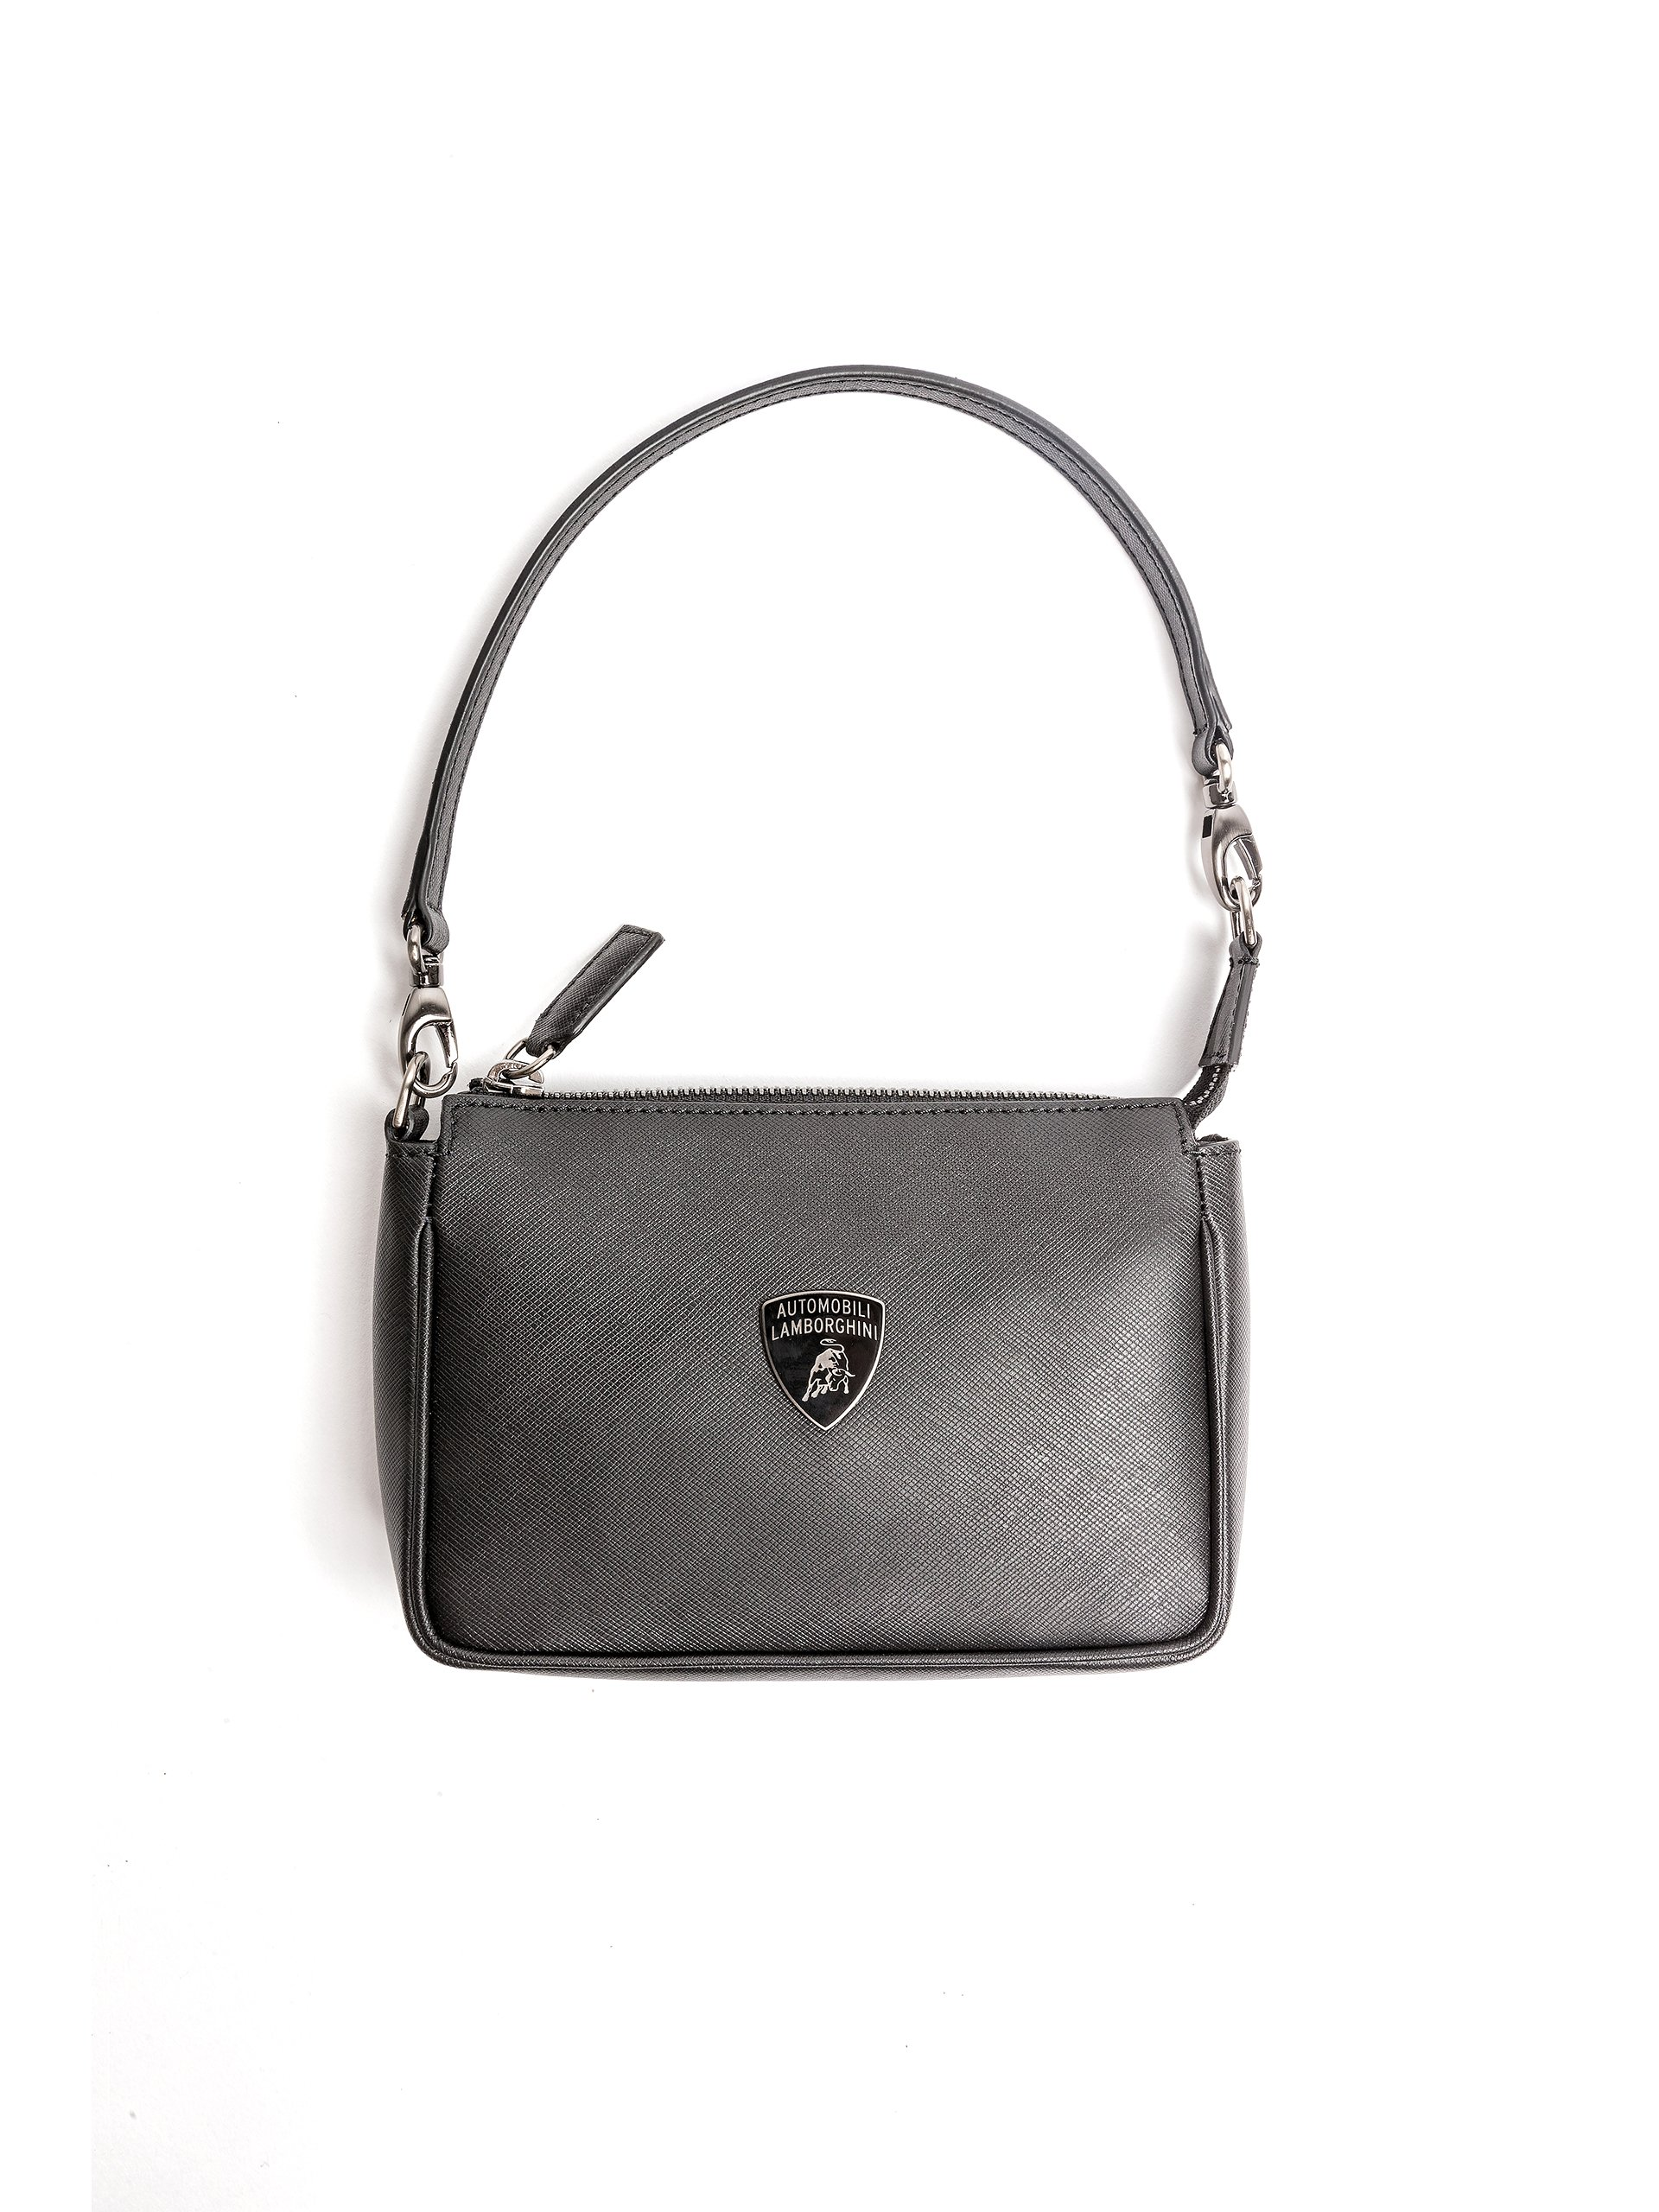 Automobili Lamborghini Accessories Clutch Bag One Size Black